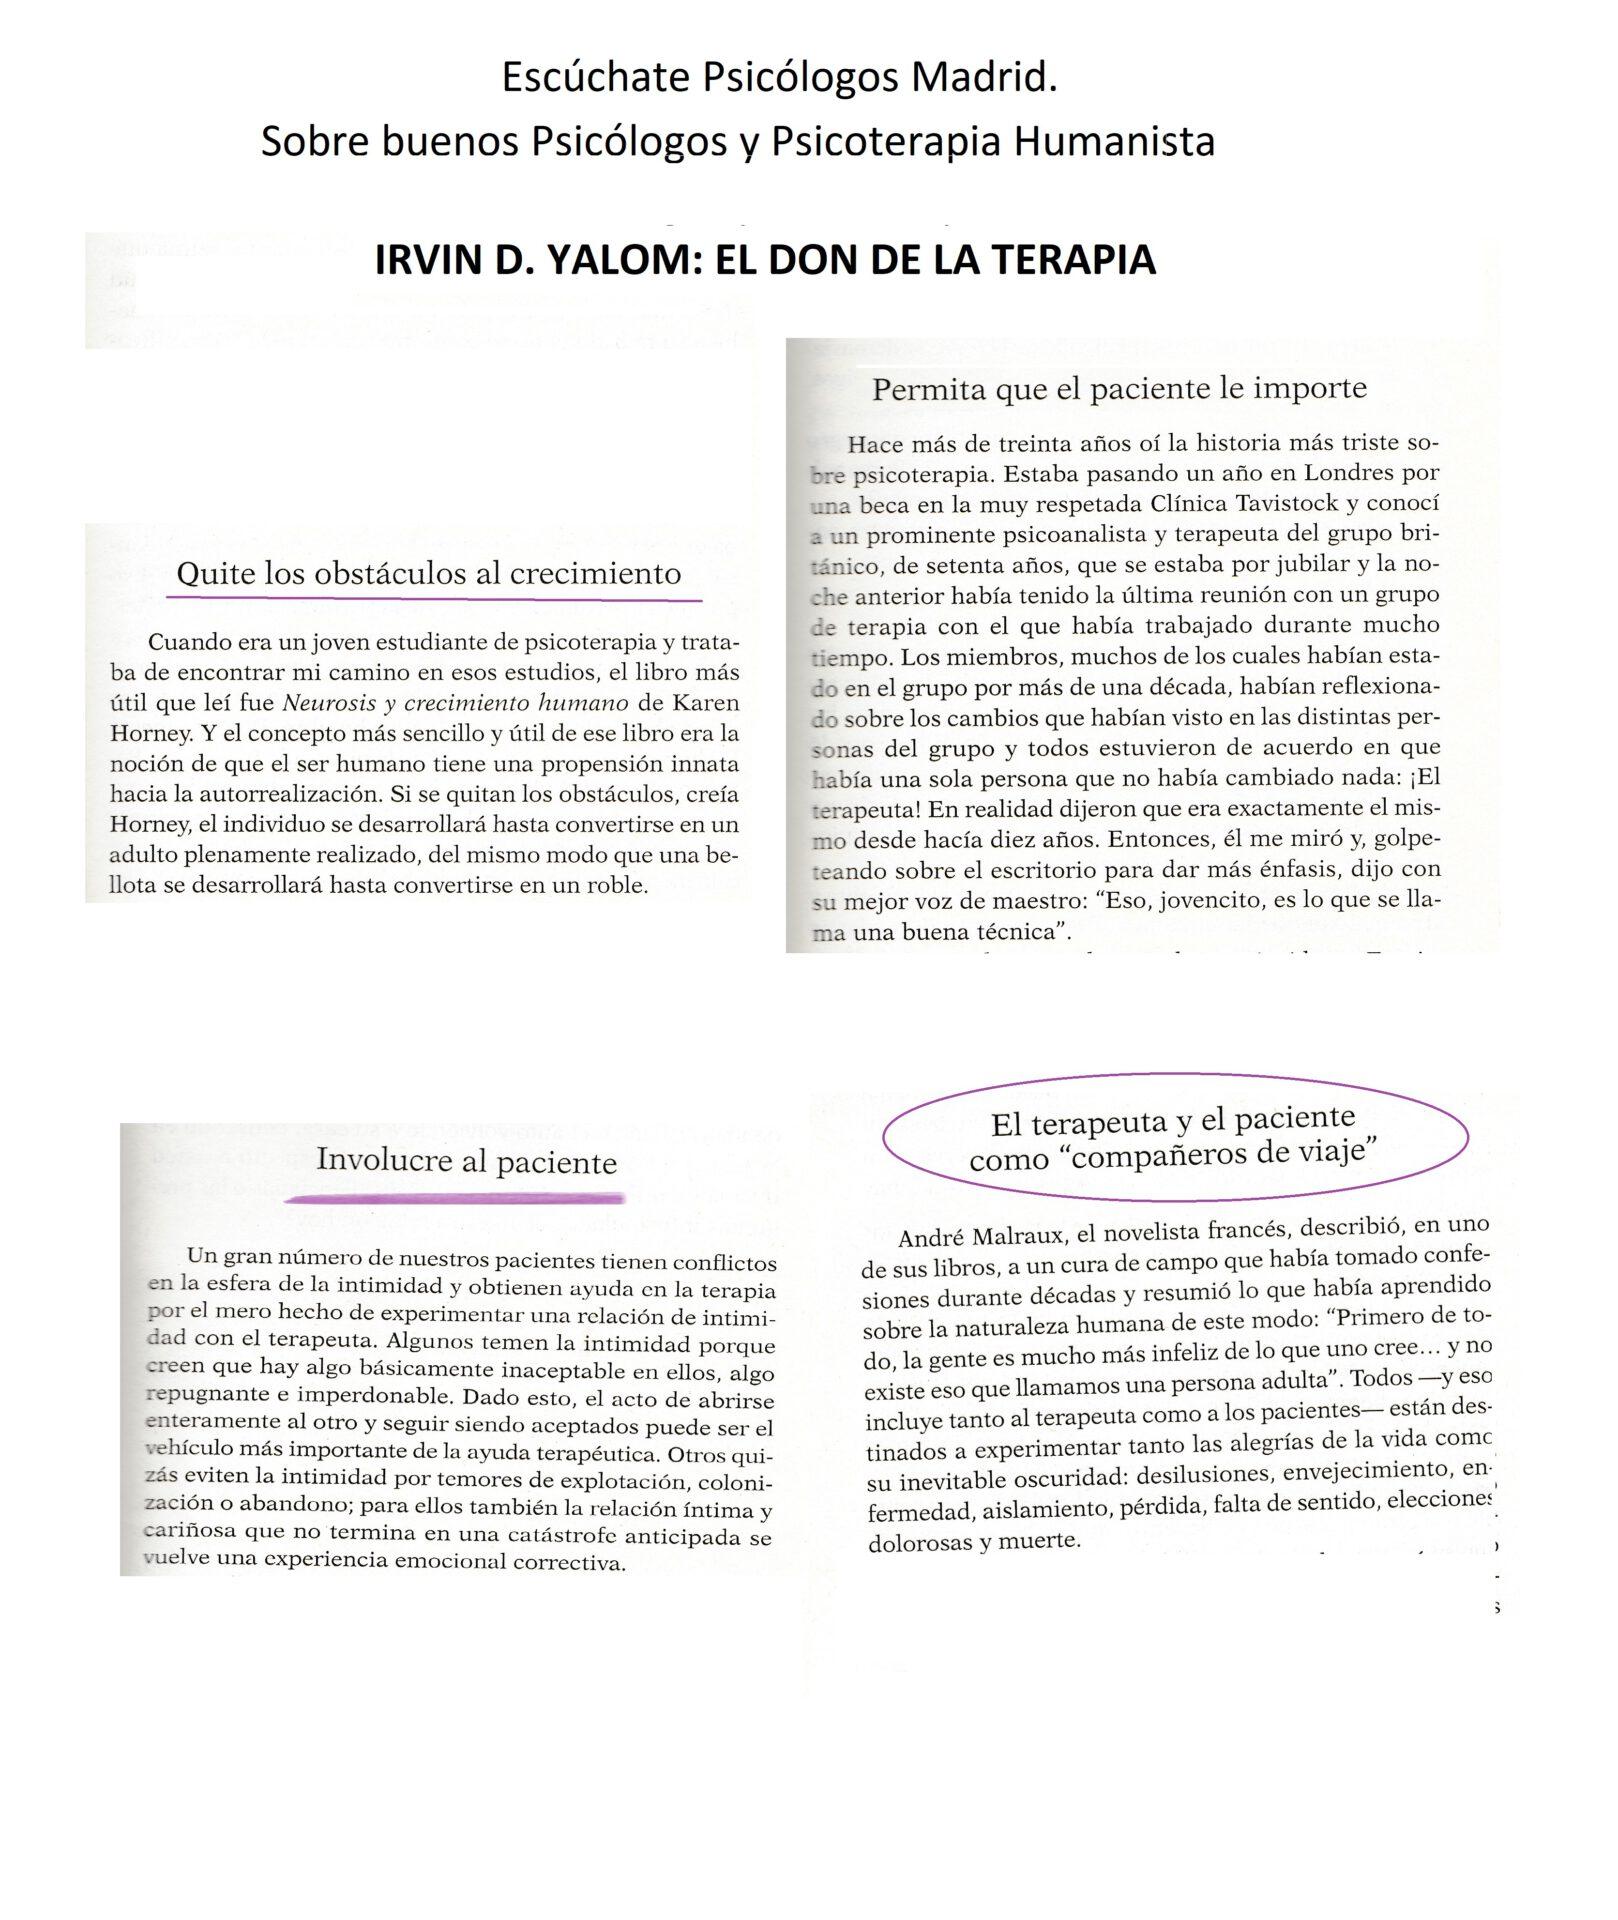 Escúchate. Buenos psicólogos en Madrid. Irvin D. Yalon